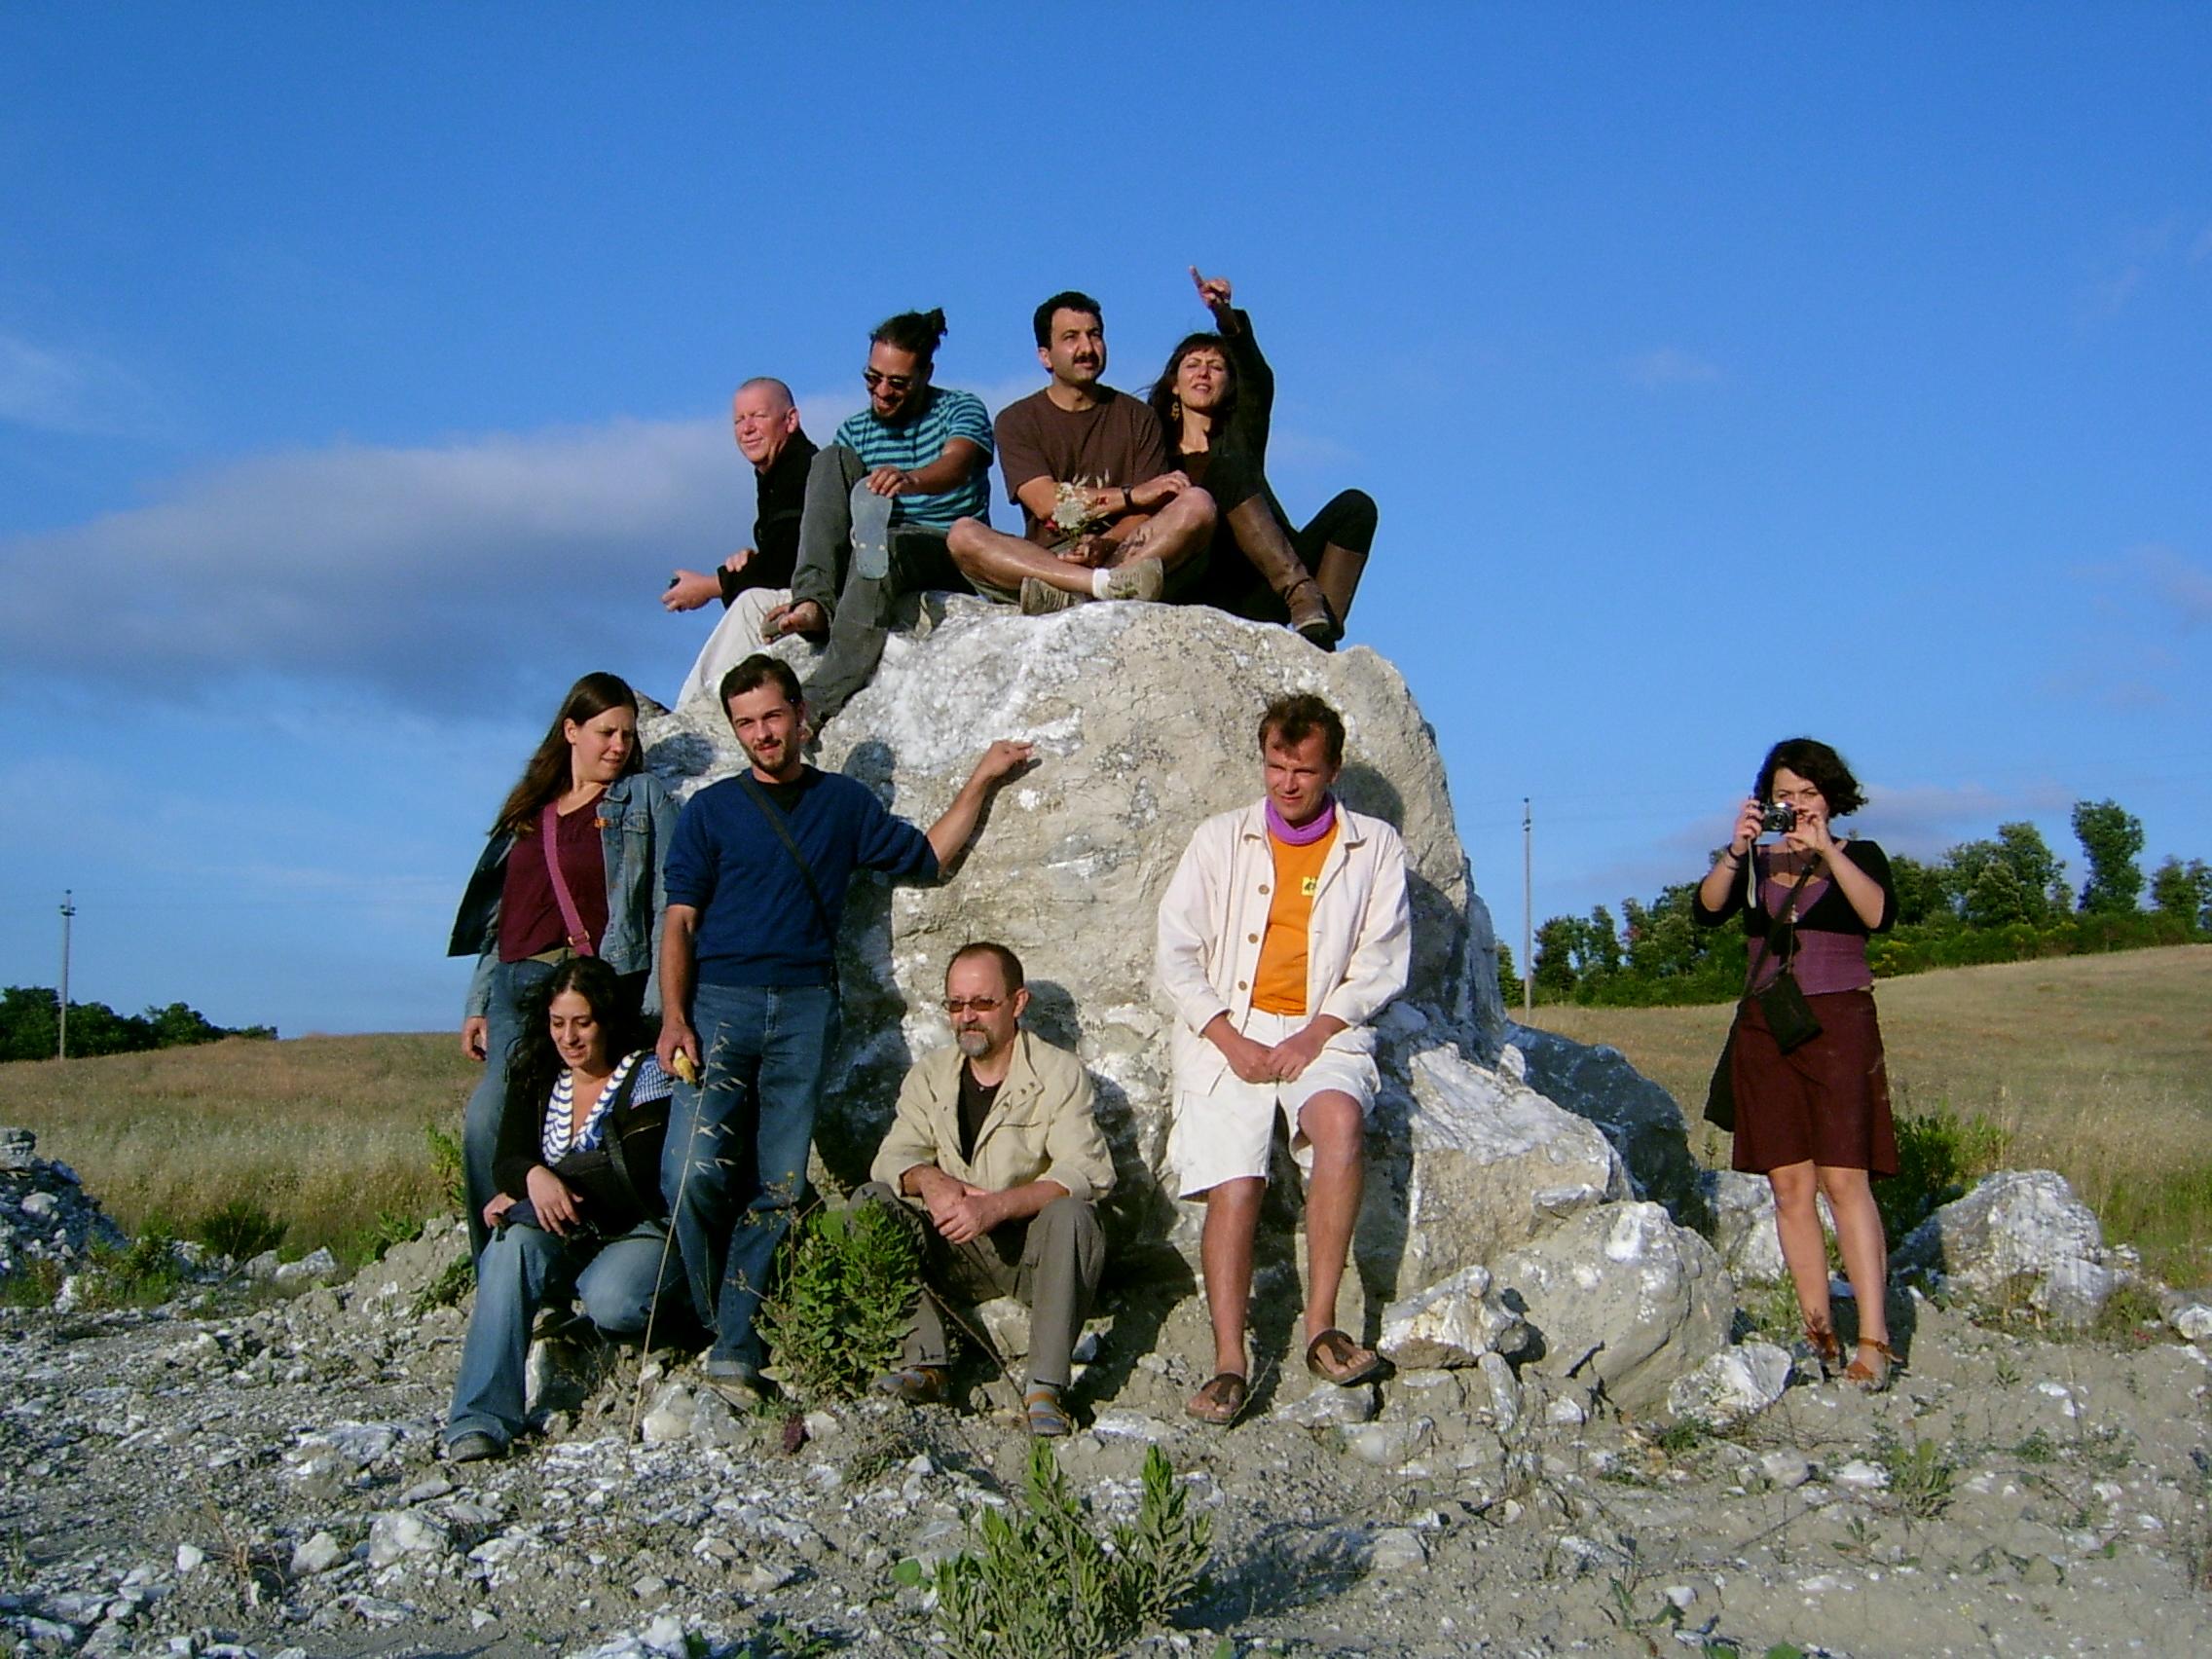 the internat.sculptor-crew in the volterra alabaster simposio june 2009